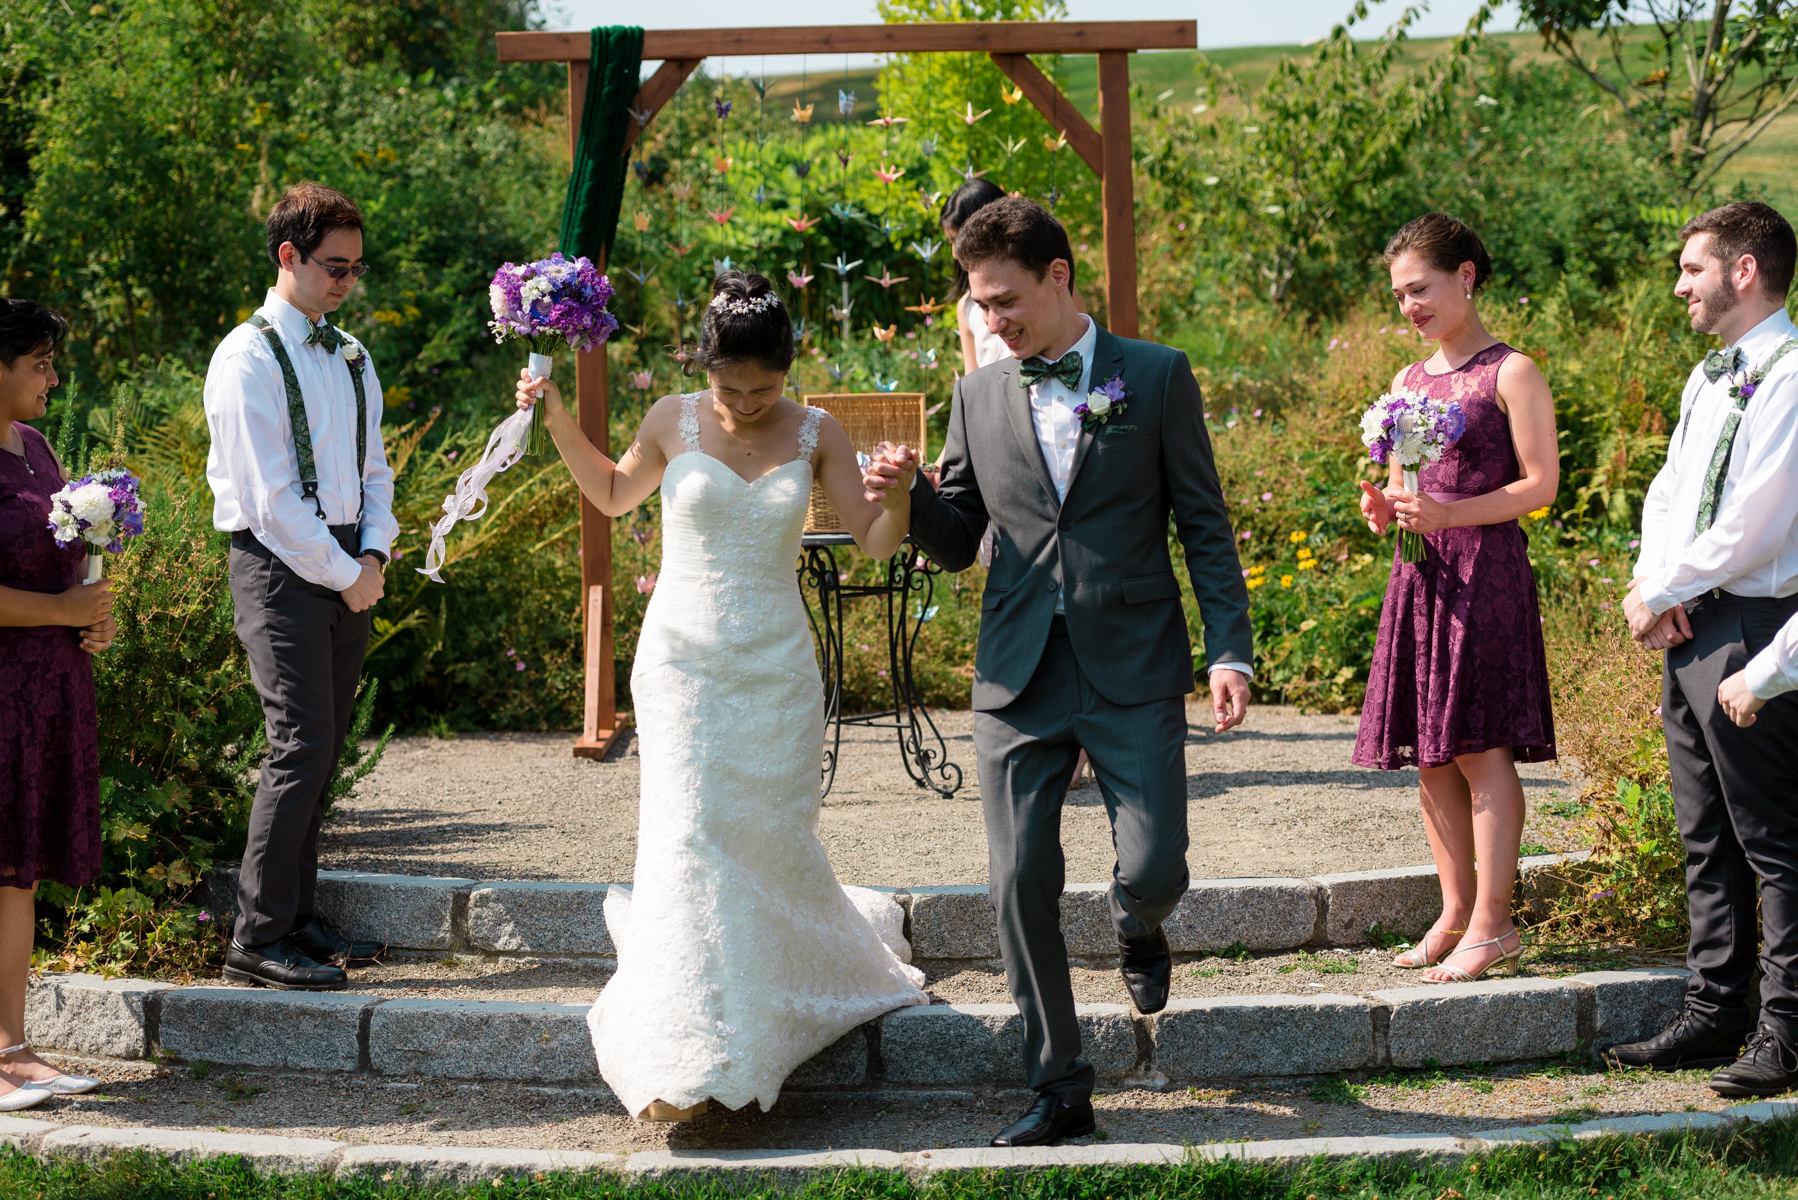 Andrew Tat - Documentary Wedding Photography - Heritage Hall - Kirkland, Washington - Grace & James - 55.JPG